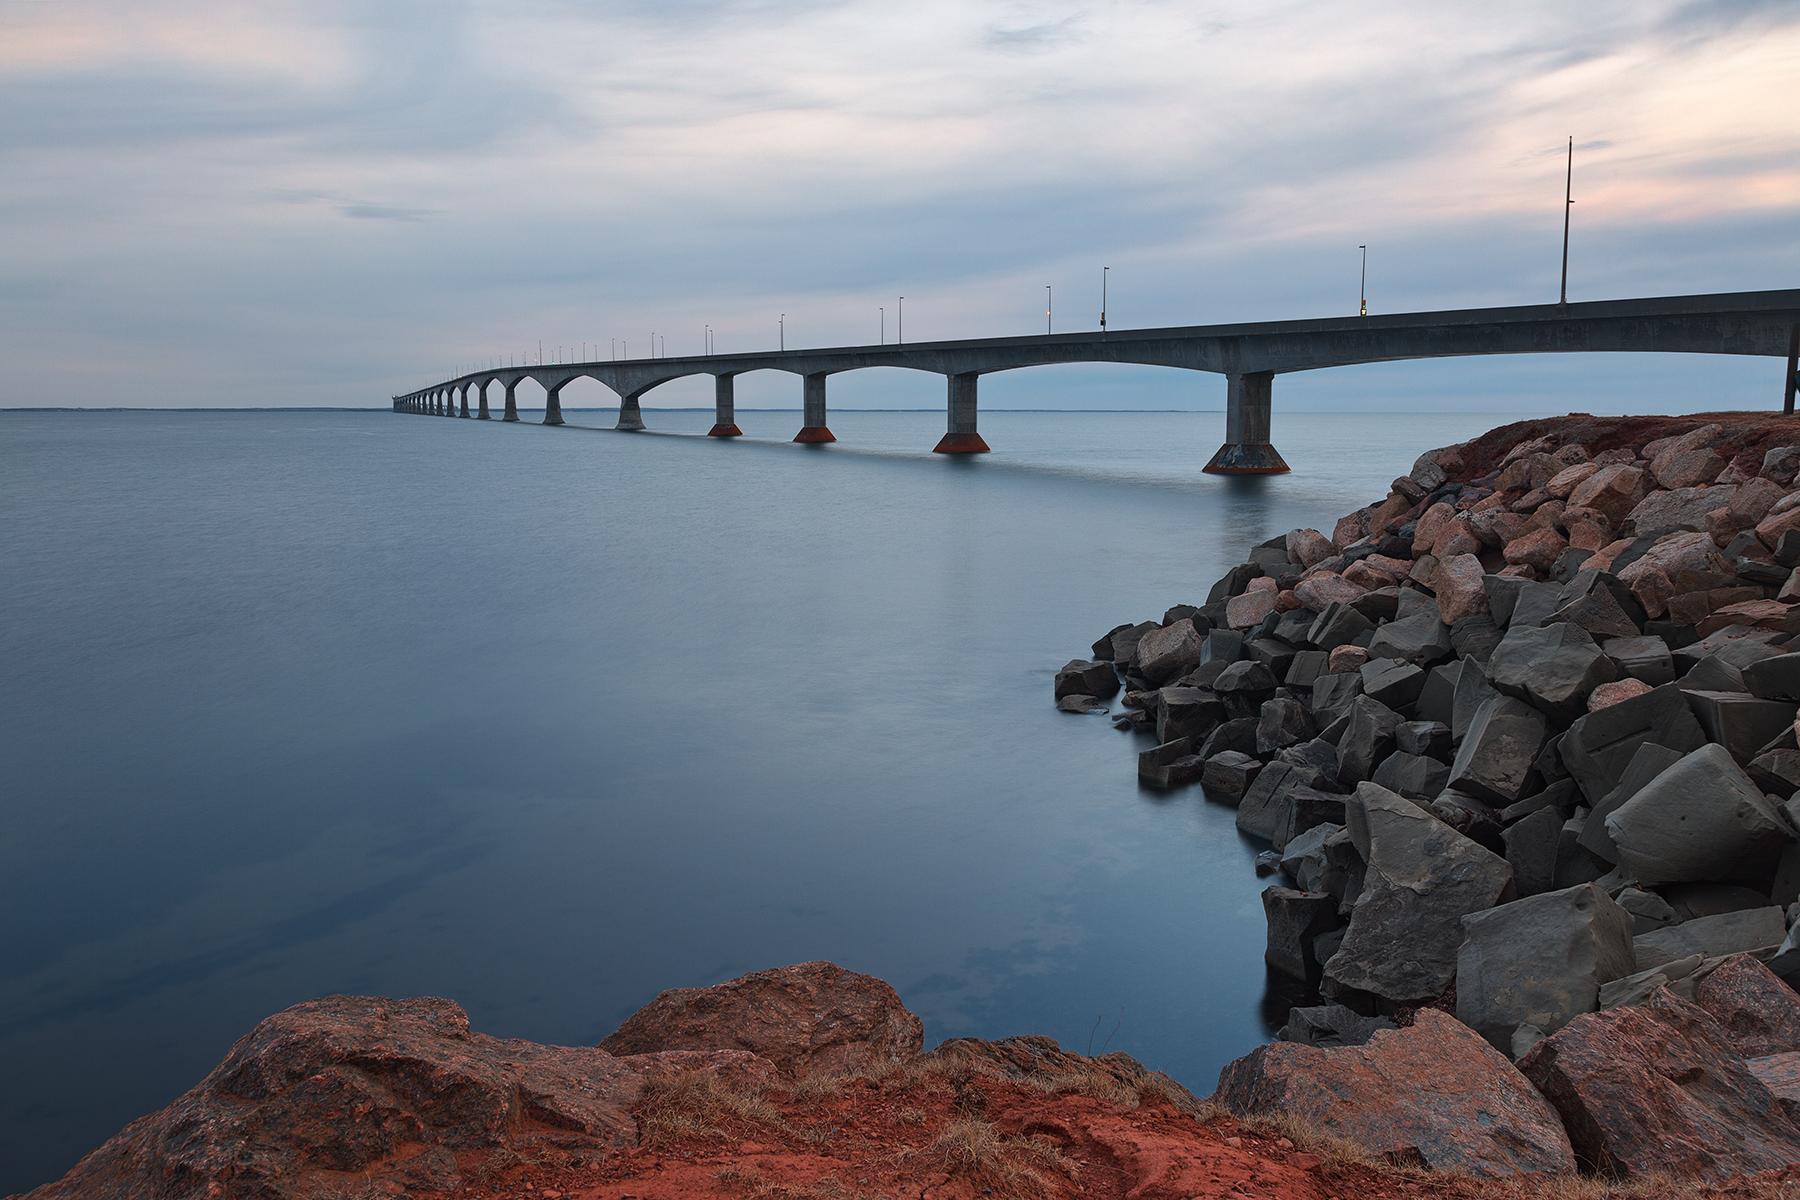 Confederation twilight bridge - hdr photo